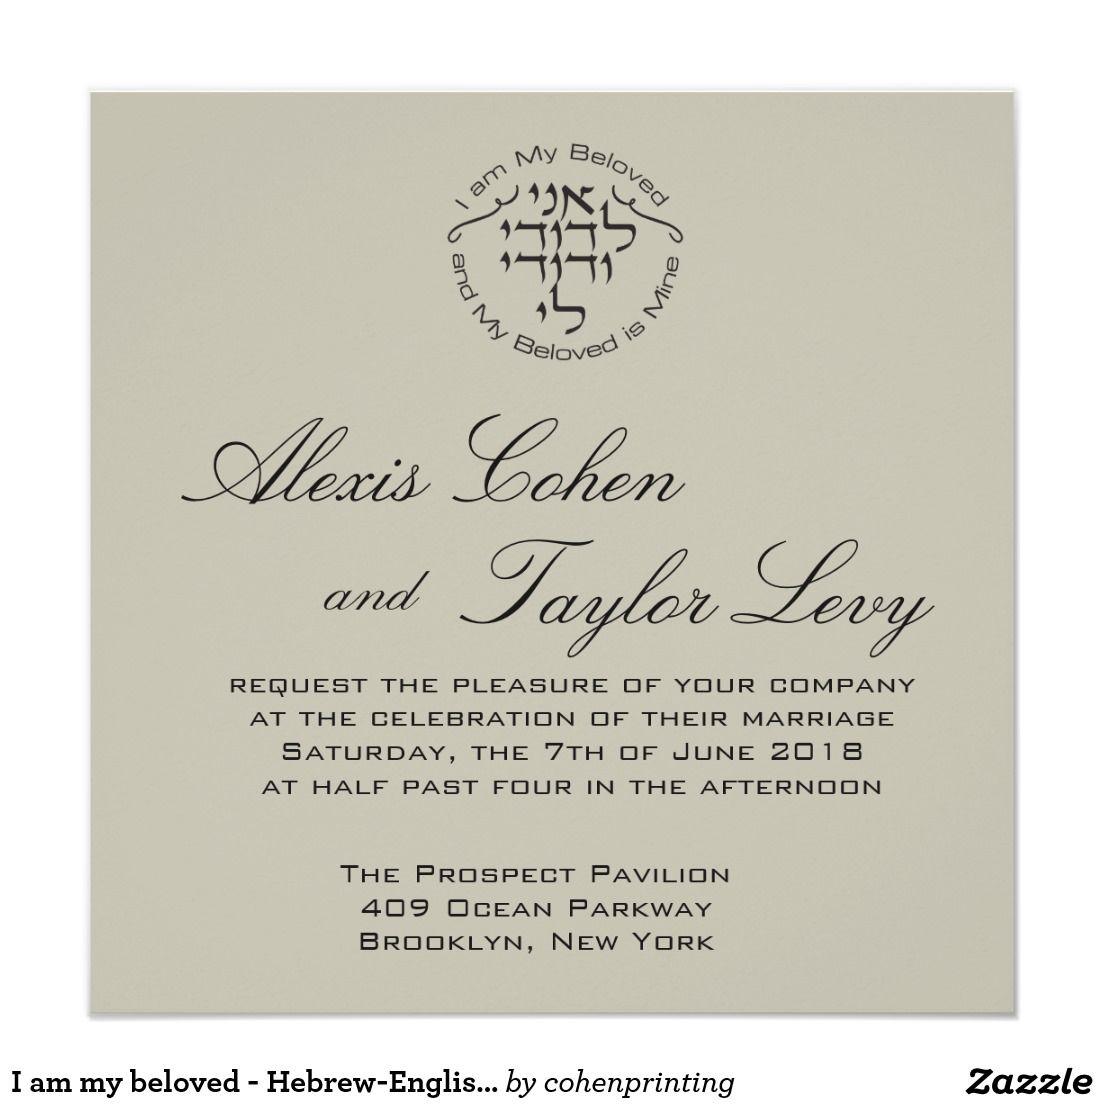 I am my beloved - Hebrew-English Wedding Invite  Zazzle.com